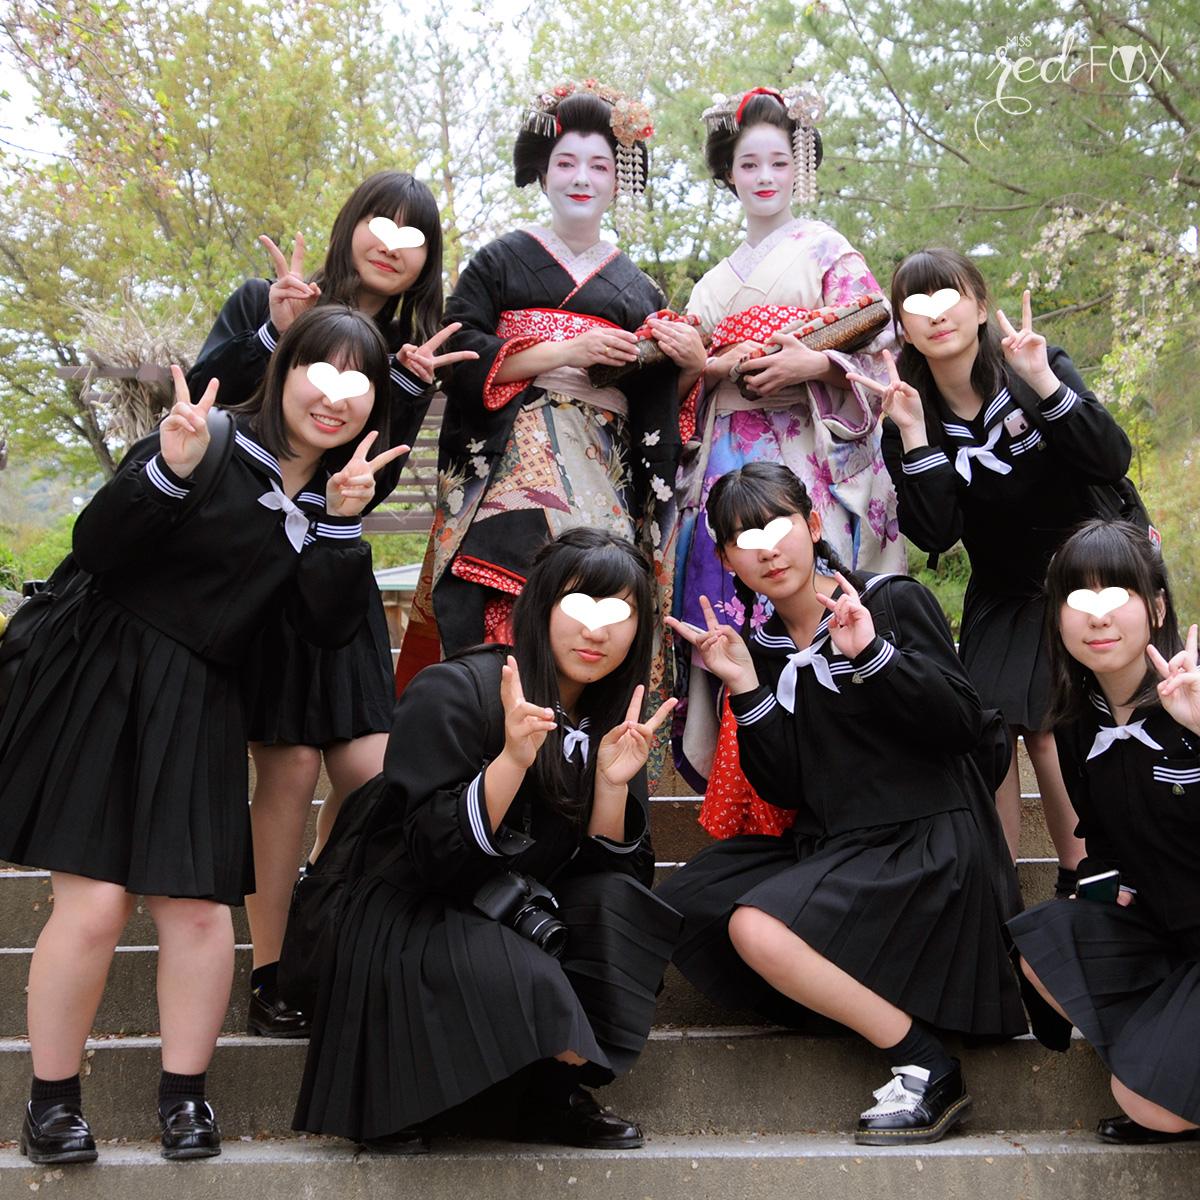 missredfox - Japan - Kyoto - 17